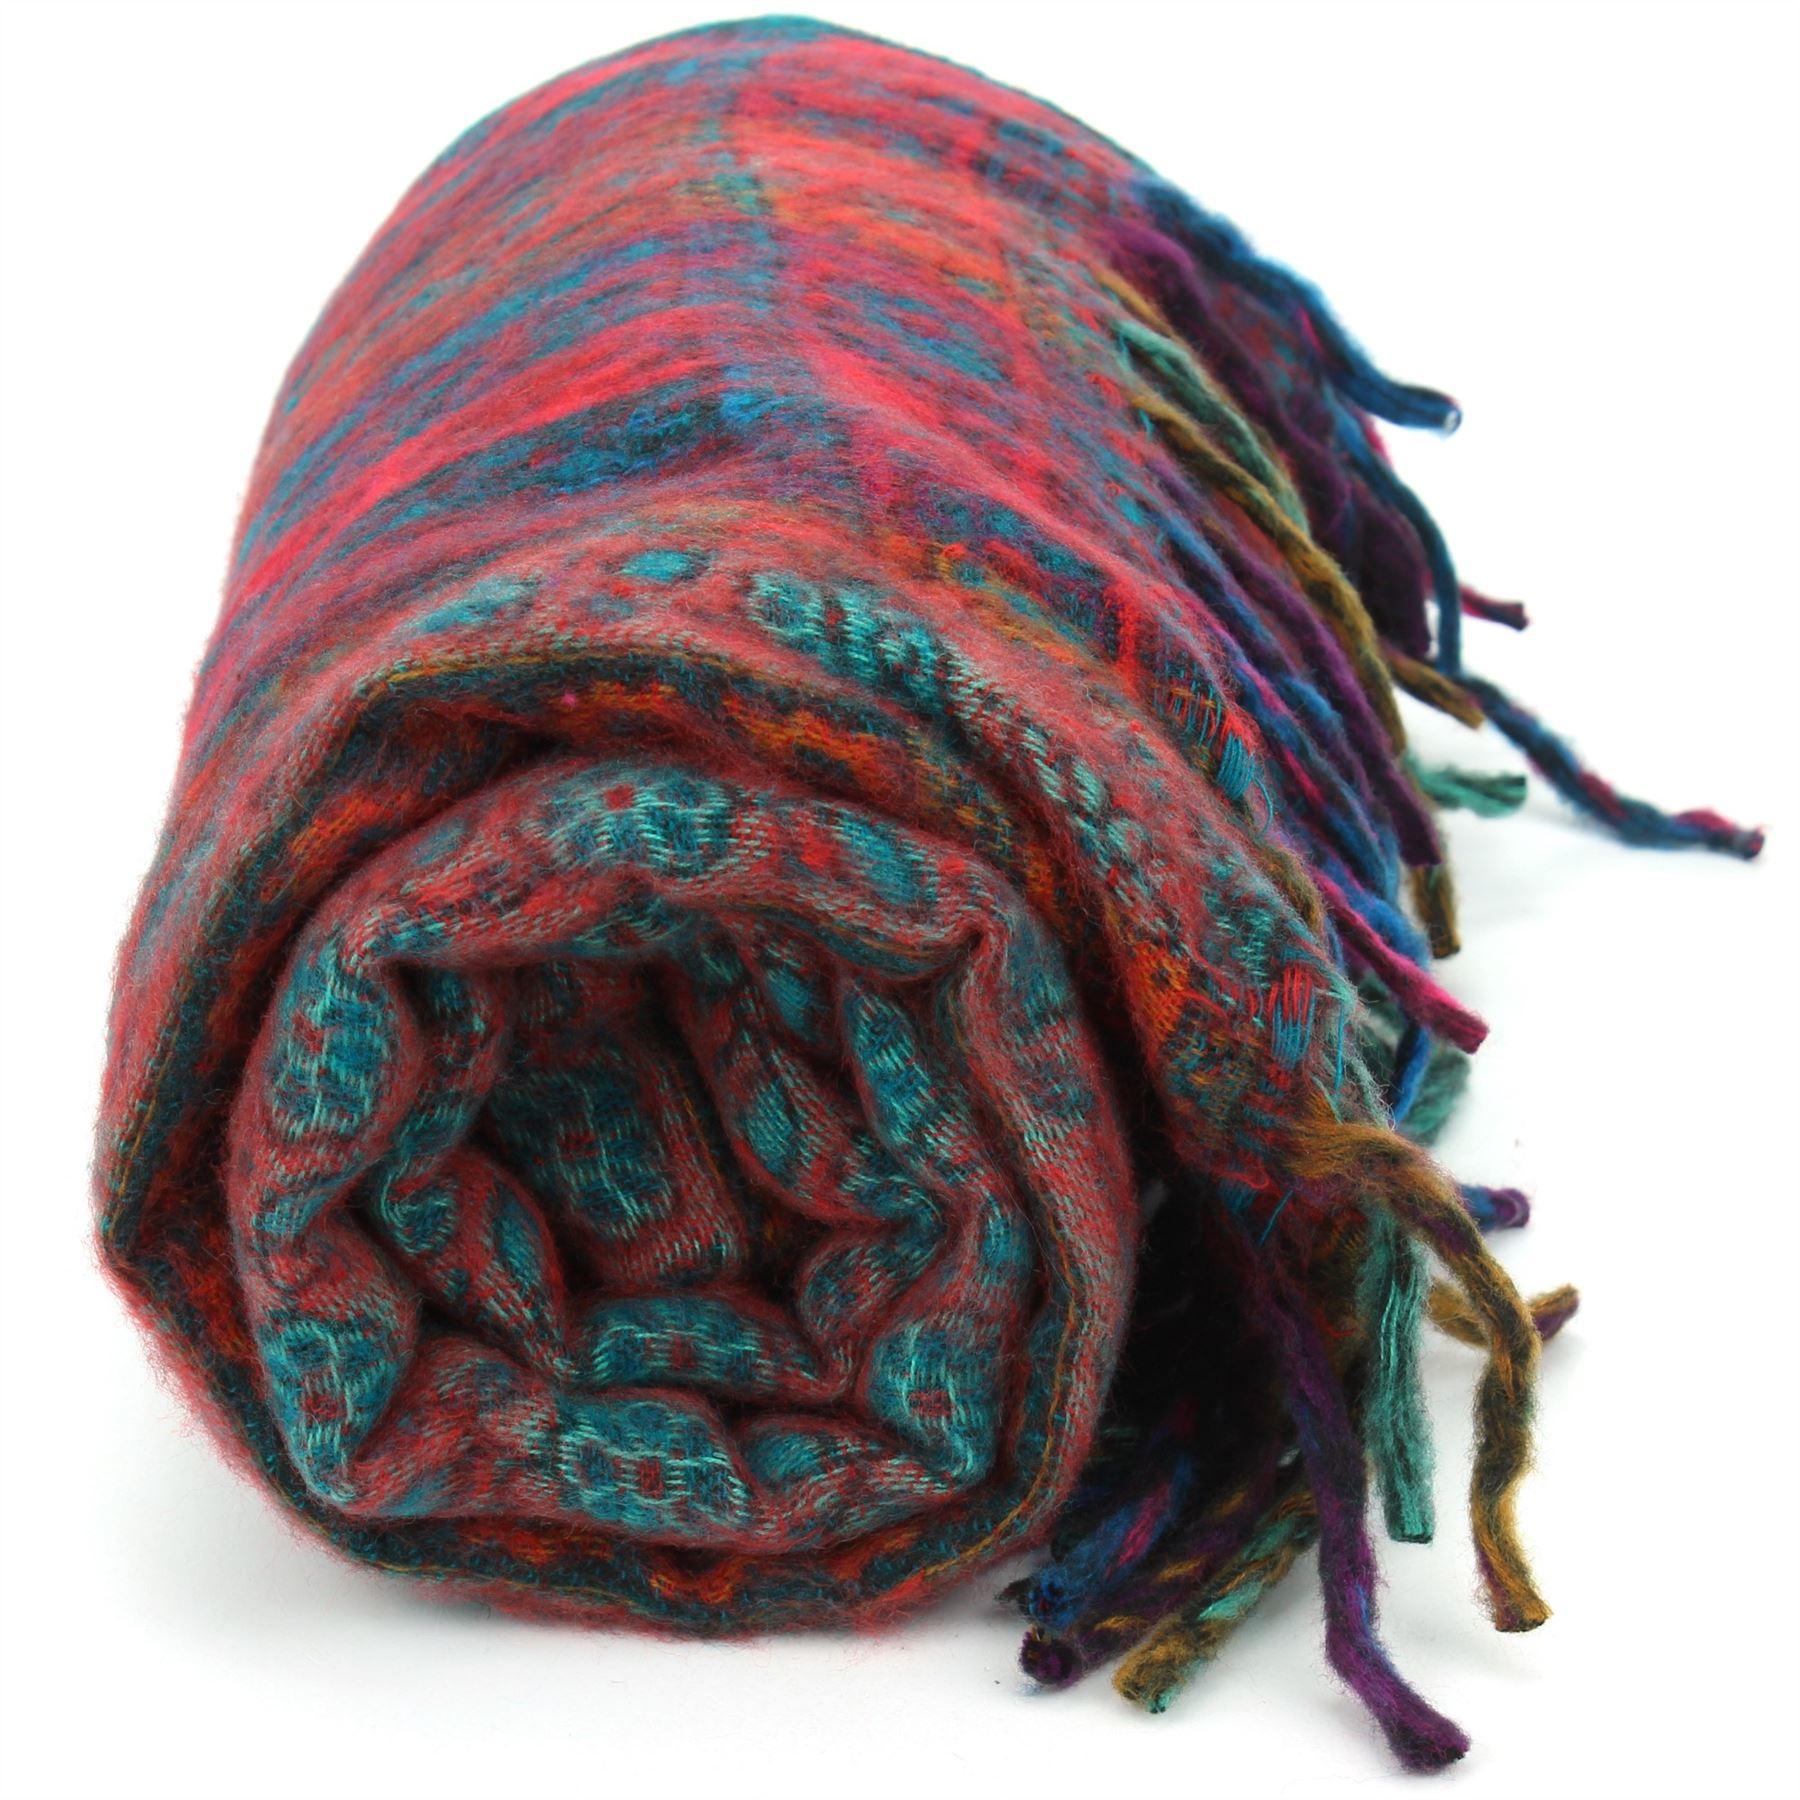 Acrylic-Wool-Blanket-Shawl-Wrap-Throw-Finest-Softest-India-Stripe-Paisley-Travel thumbnail 48